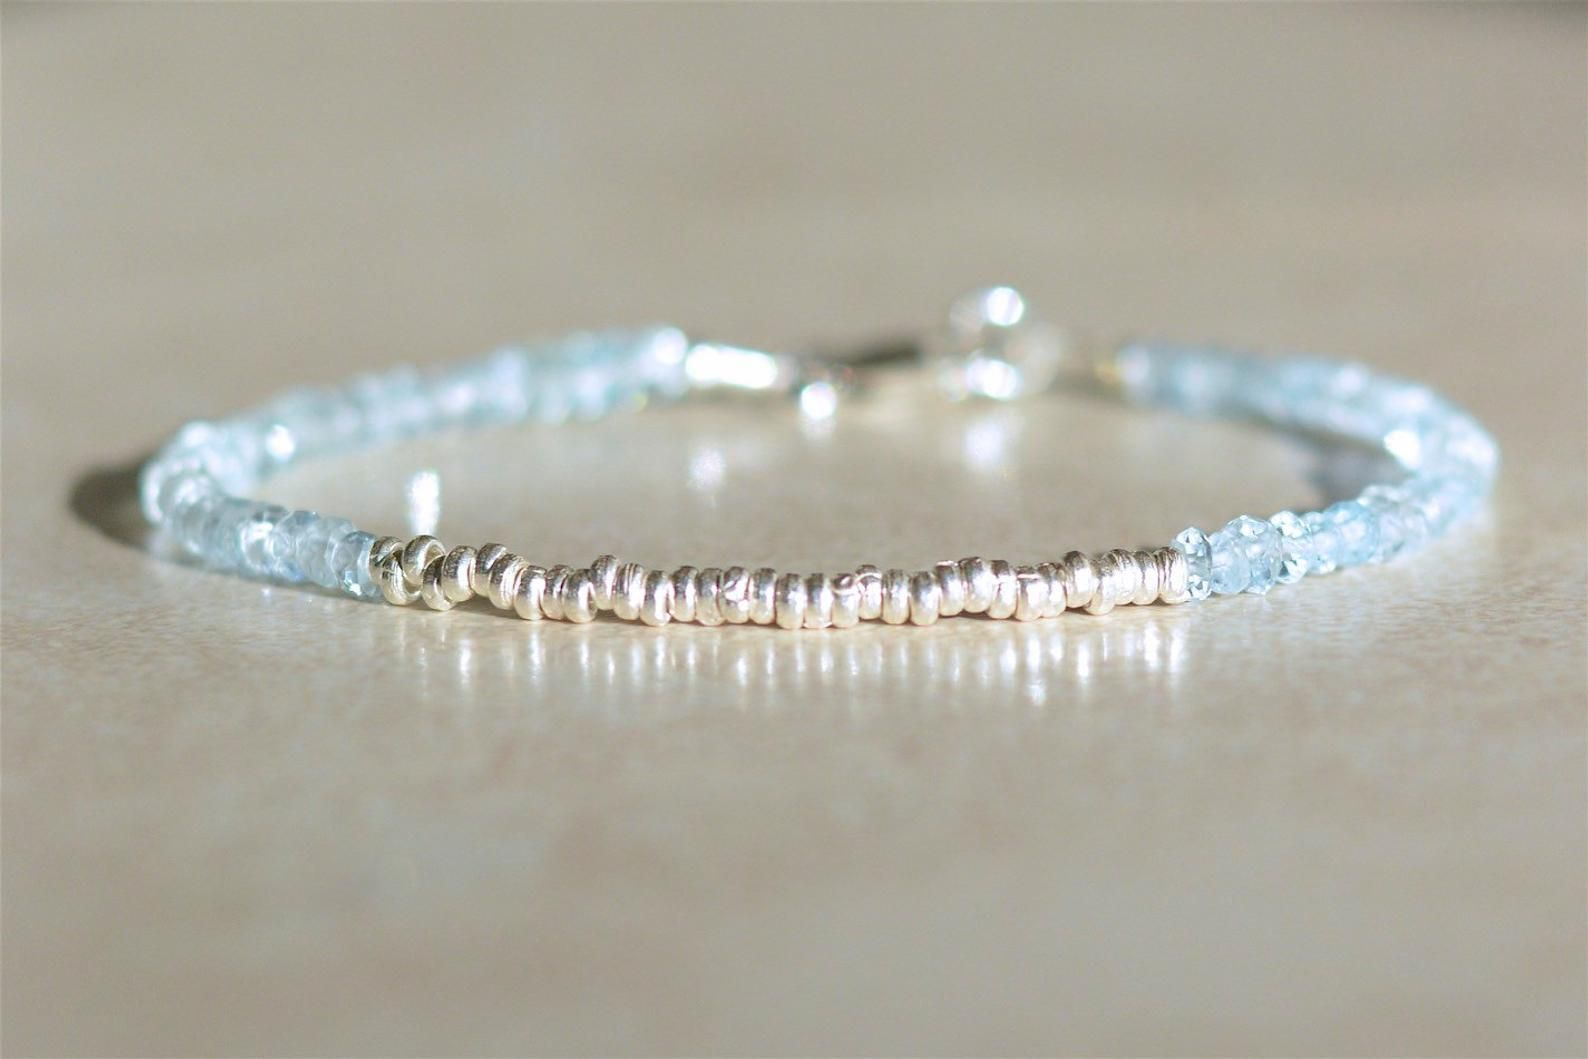 Gift for Wife March Birthstone Bracelet Minimalist Bracelet Dainty Silver Bracelet Aquamarine Bracelet Gift for Her Birthstone Gift